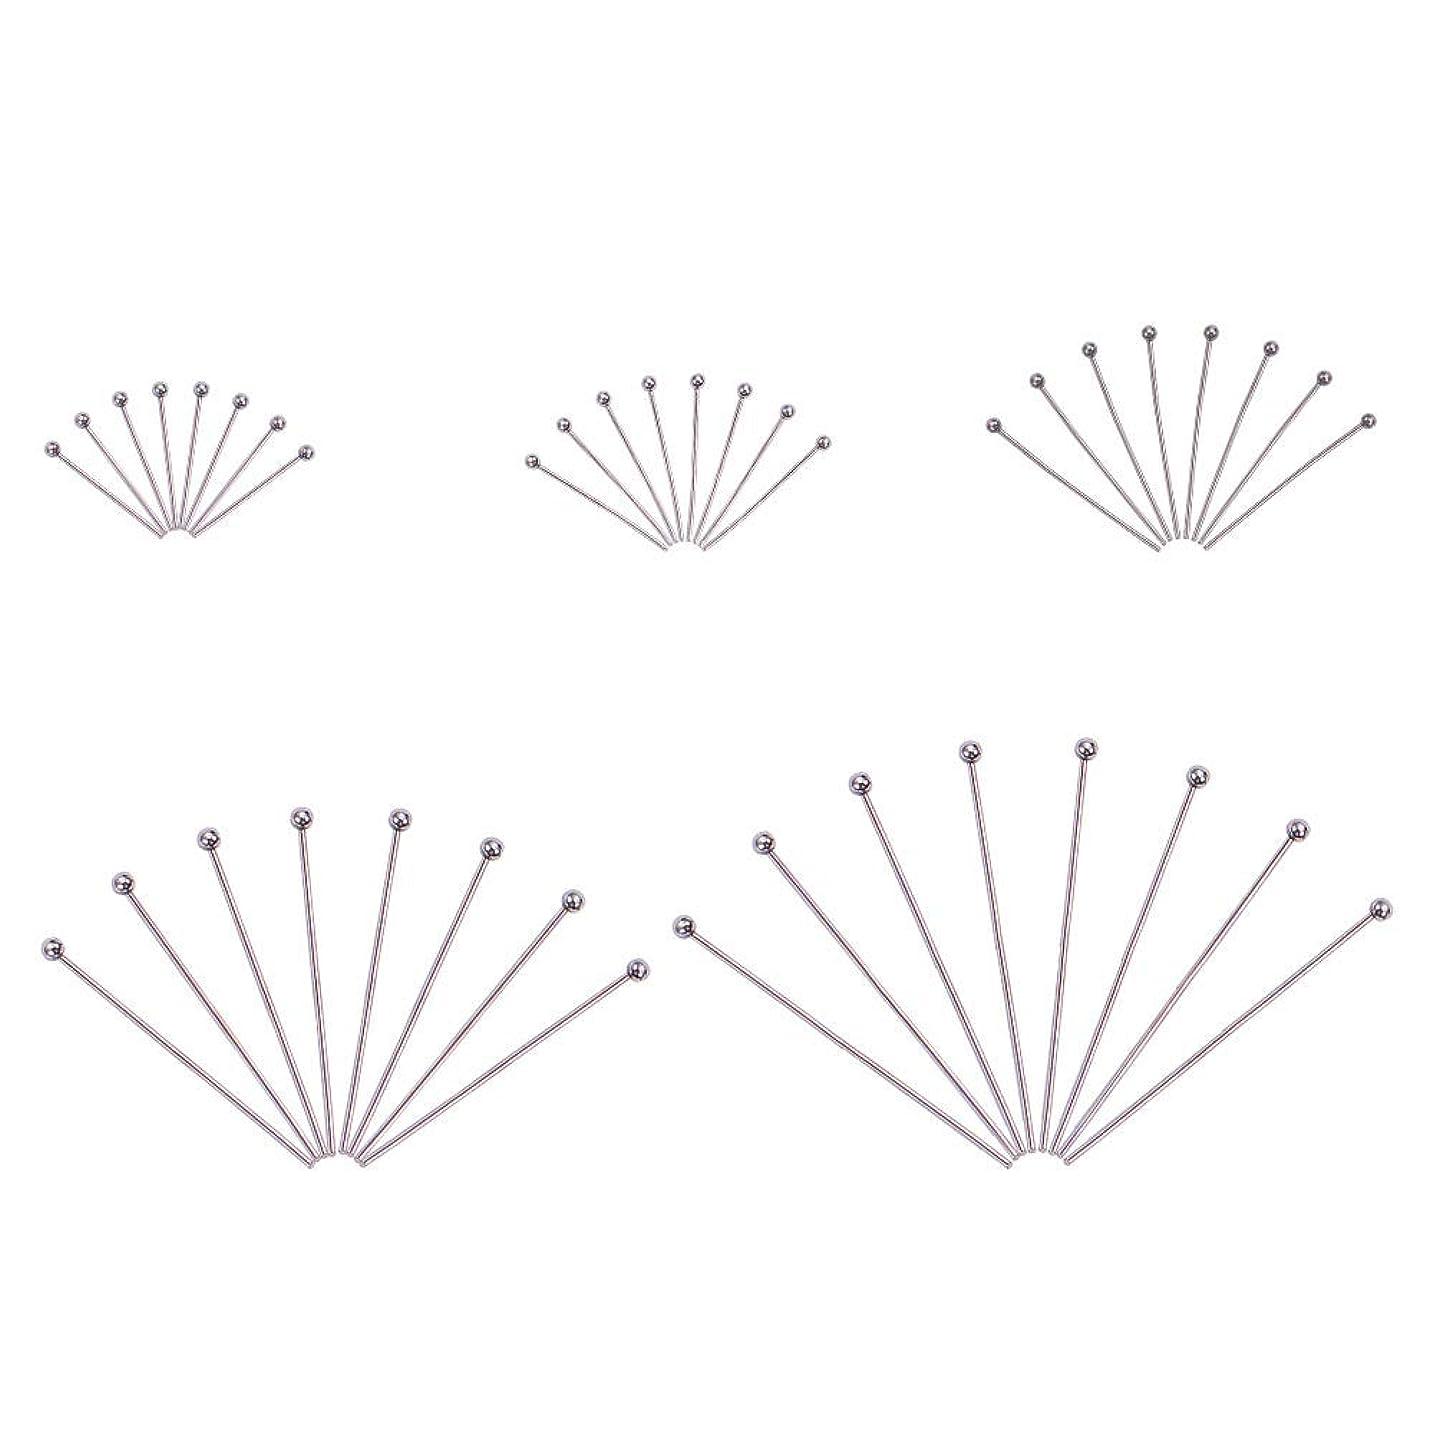 "PH PandaHall 500PCS 5-Sizes Stainless Steel Ball Head Pins Ball Headpins Ball Pins for DIY Jewelry Making(0.7"", 0.8"", 1"", 1.2"", 1.5"")"